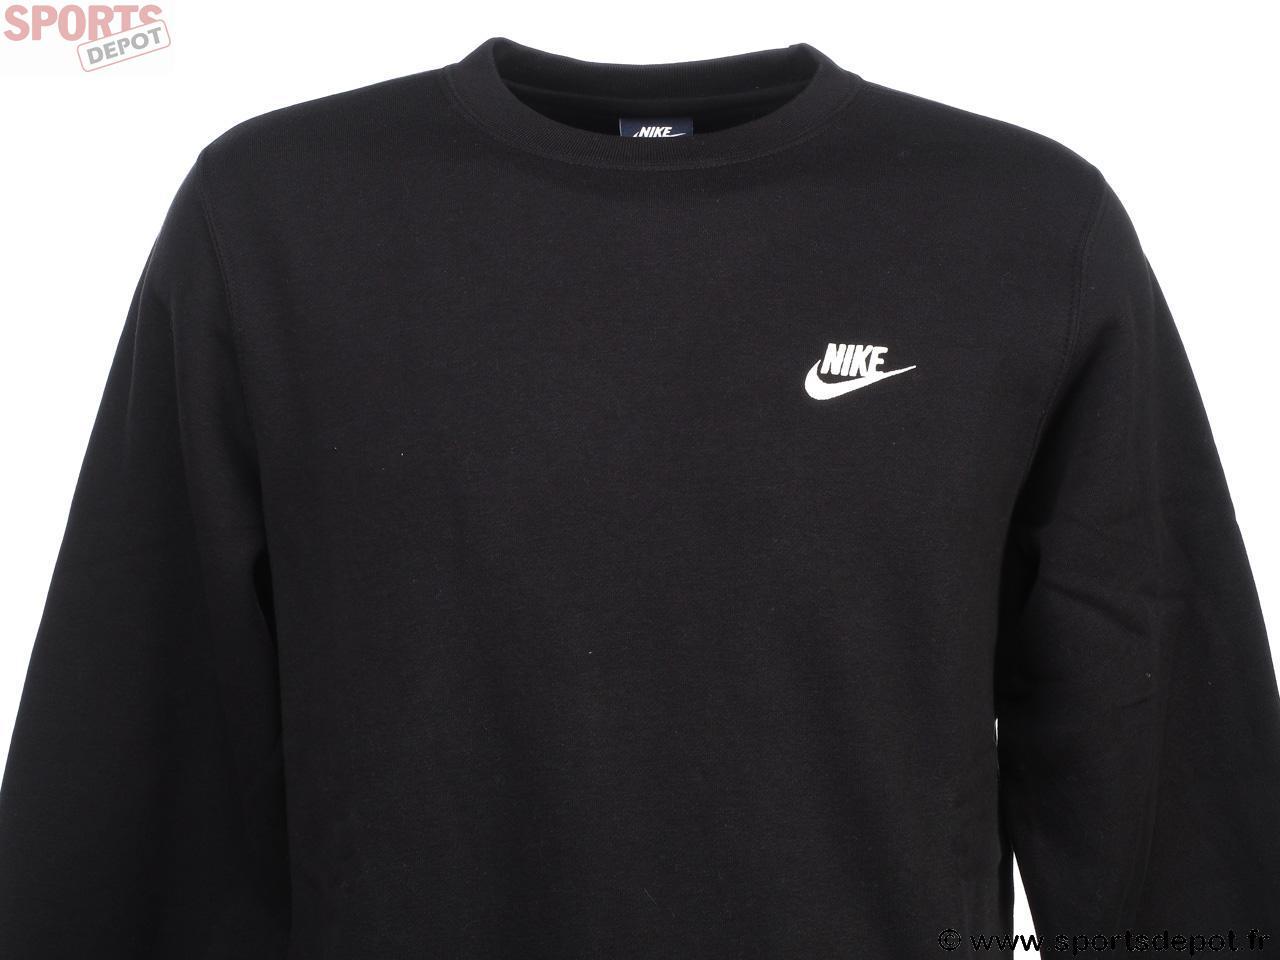 H Crew Acheter Mixte Comparer Achat Nike Club Homme Noir 2 Sweat x7PqPtYwa